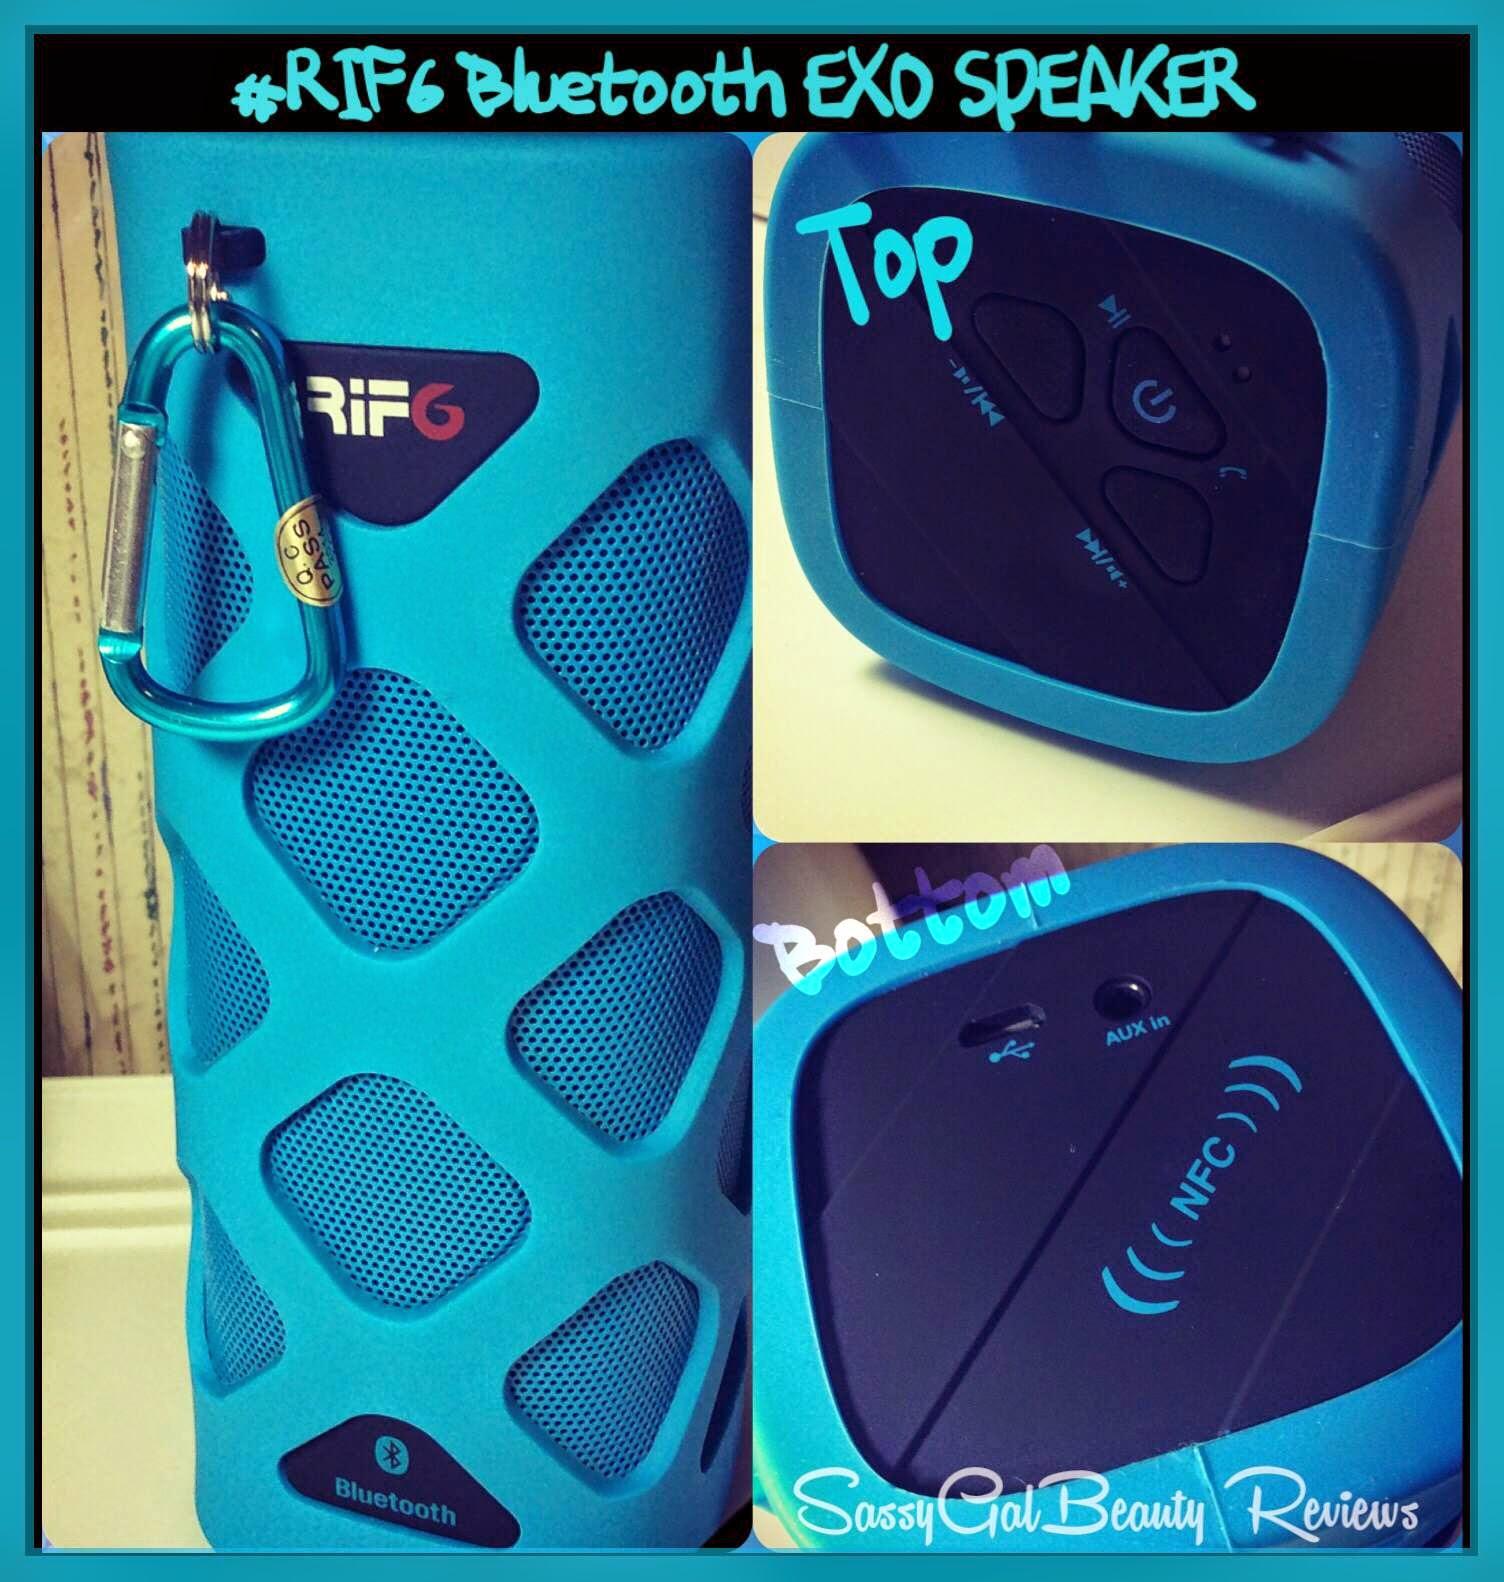 RIF6 Bluetooth EXO Speaker